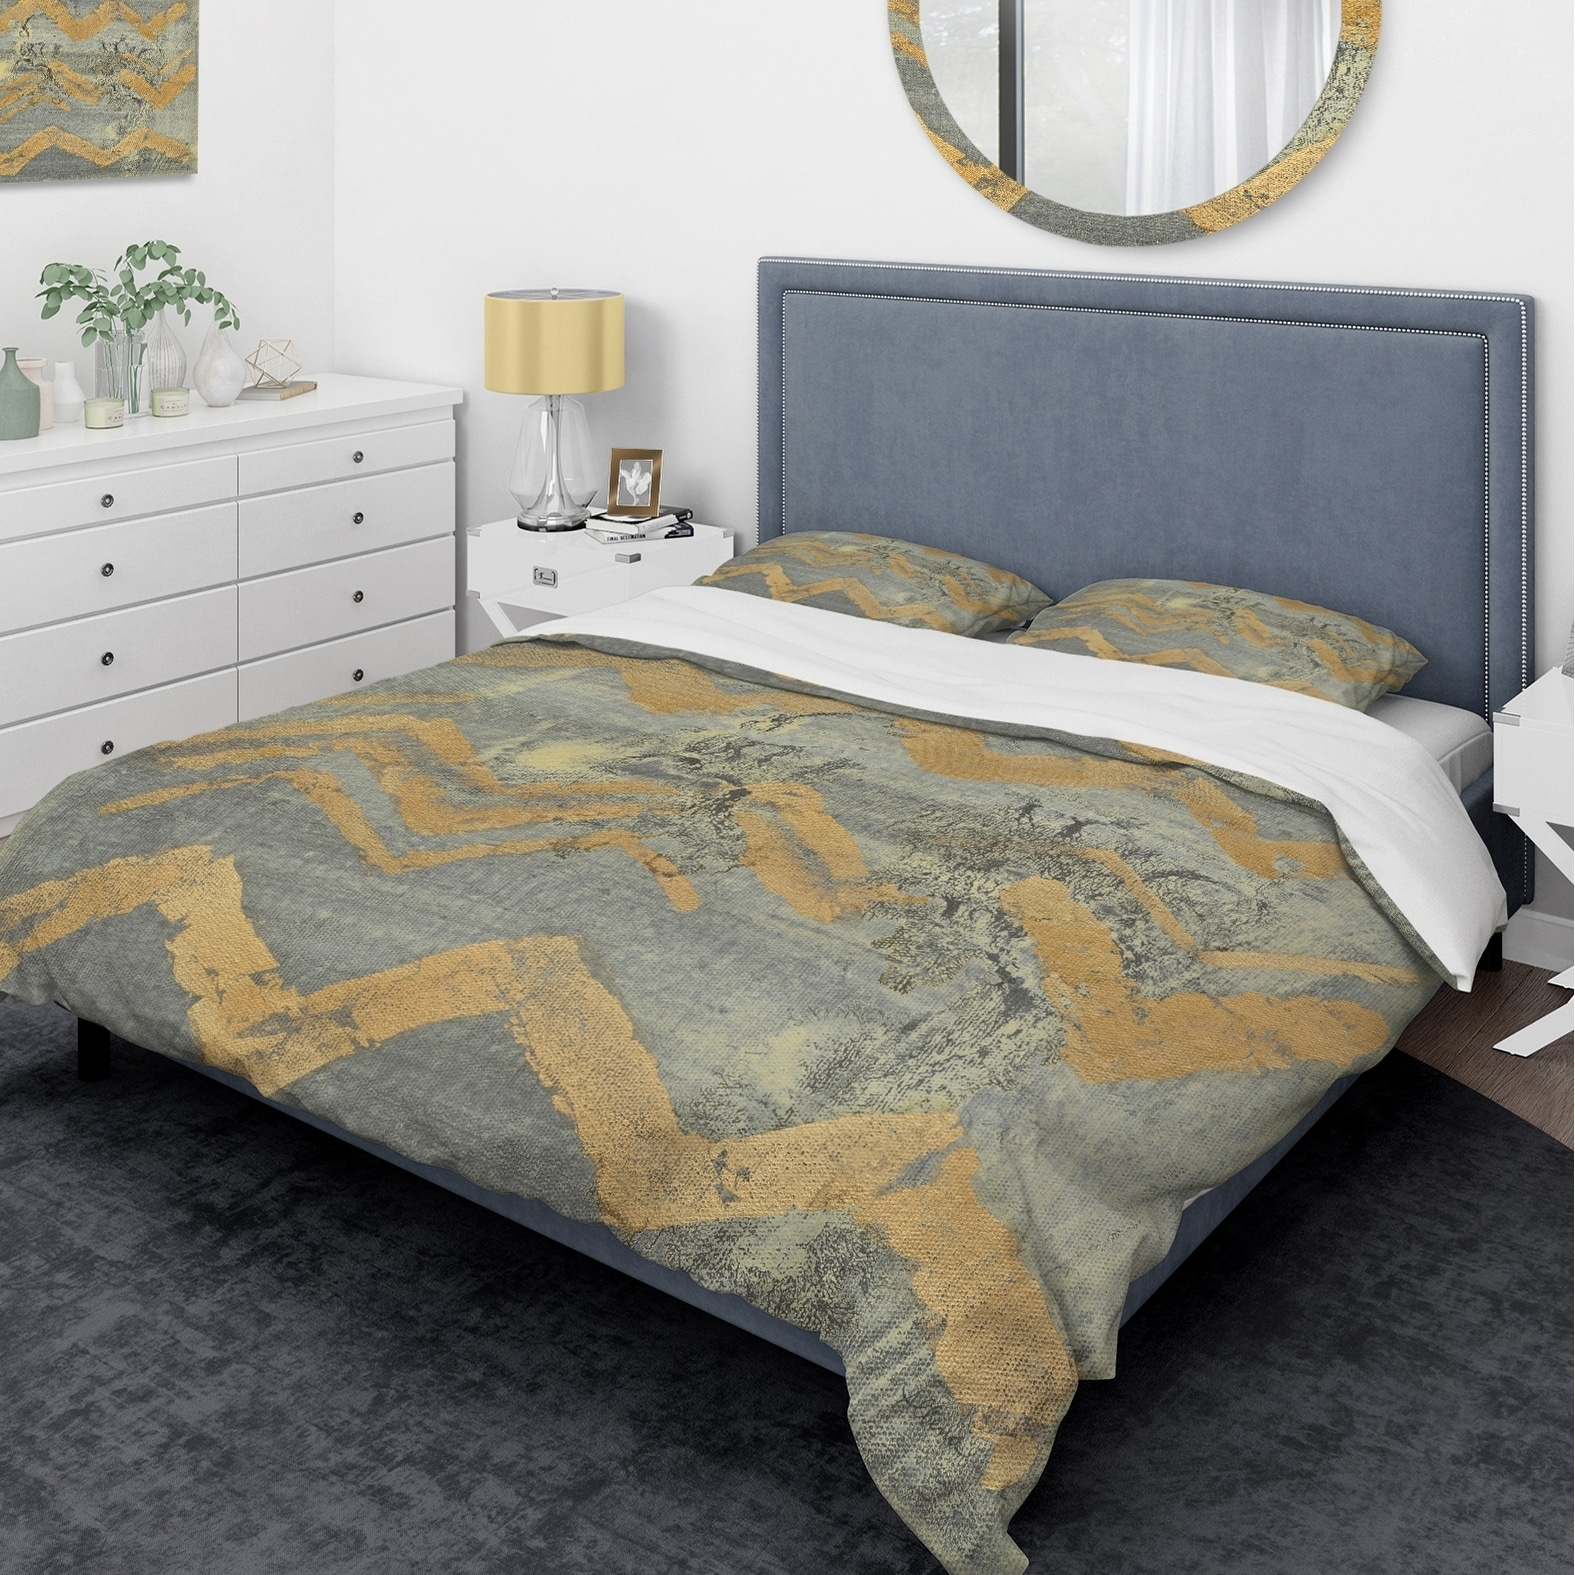 DESIGN ART Designart 'Glam Metallic Form III' Glam Bedding Set - Duvet Cover & Shams